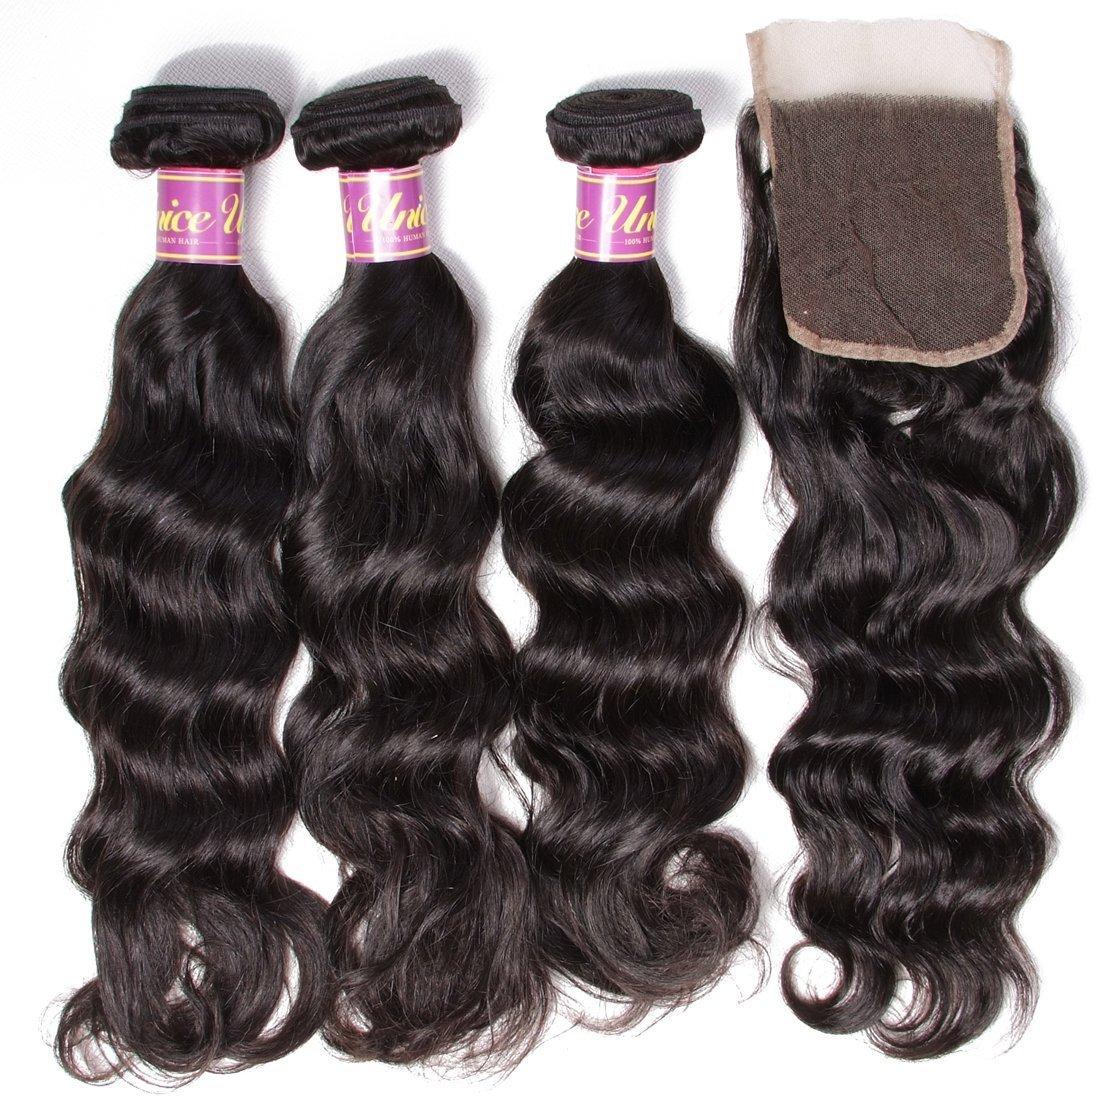 Unice 7A Grade Brazilian Natural Wave Hair 100% Virgin Human Hair 3 Bundles with Closure Natural Color (20 22 24+18Free Closure) by UNICE (Image #5)